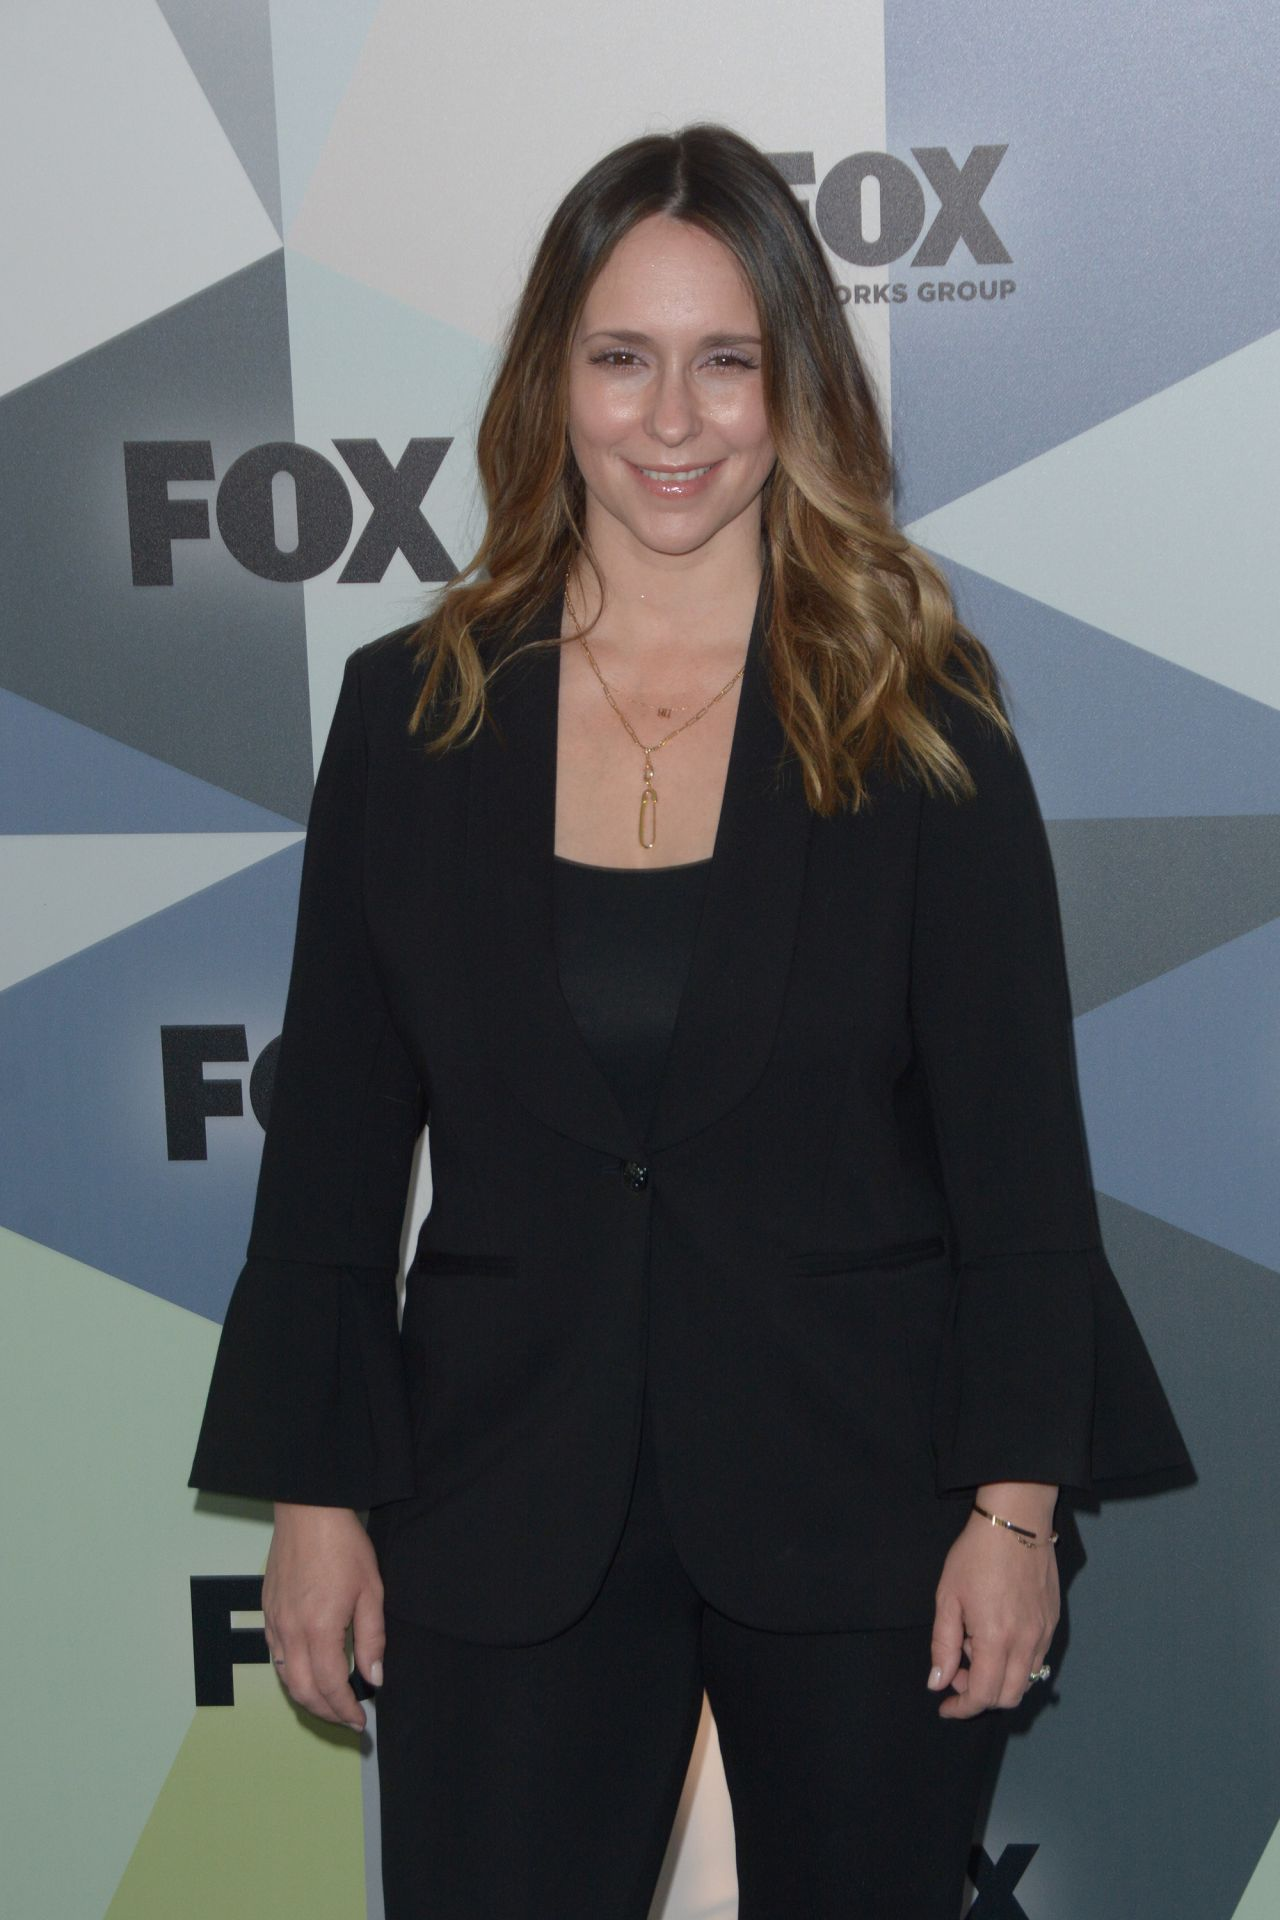 Jennifer Love Hewitt 2018 Fox Network Upfront In Nyc